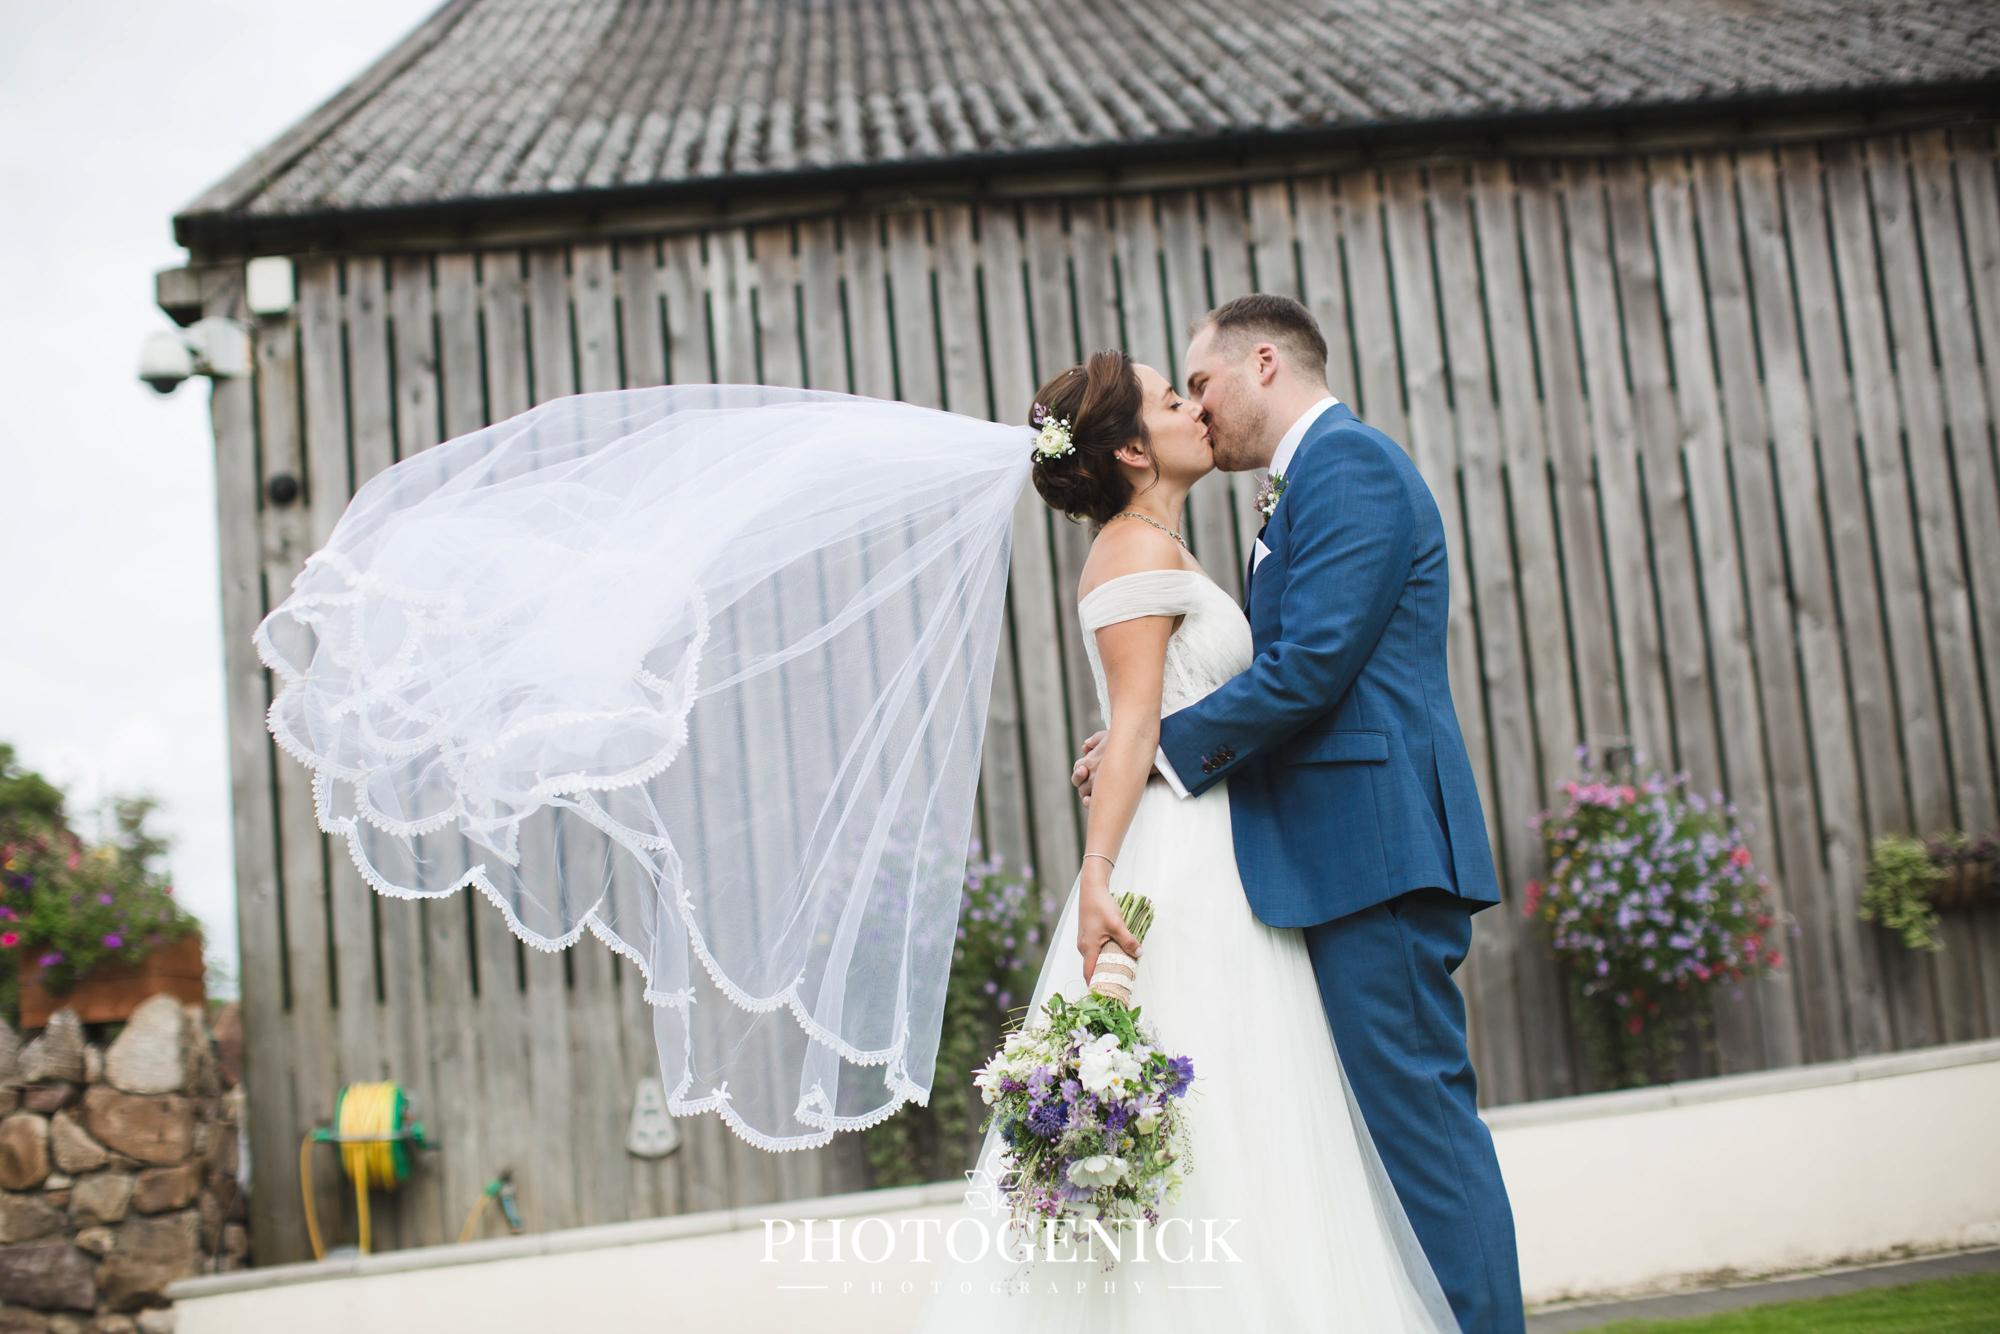 oldwalls gower wedding photographers-39.jpg